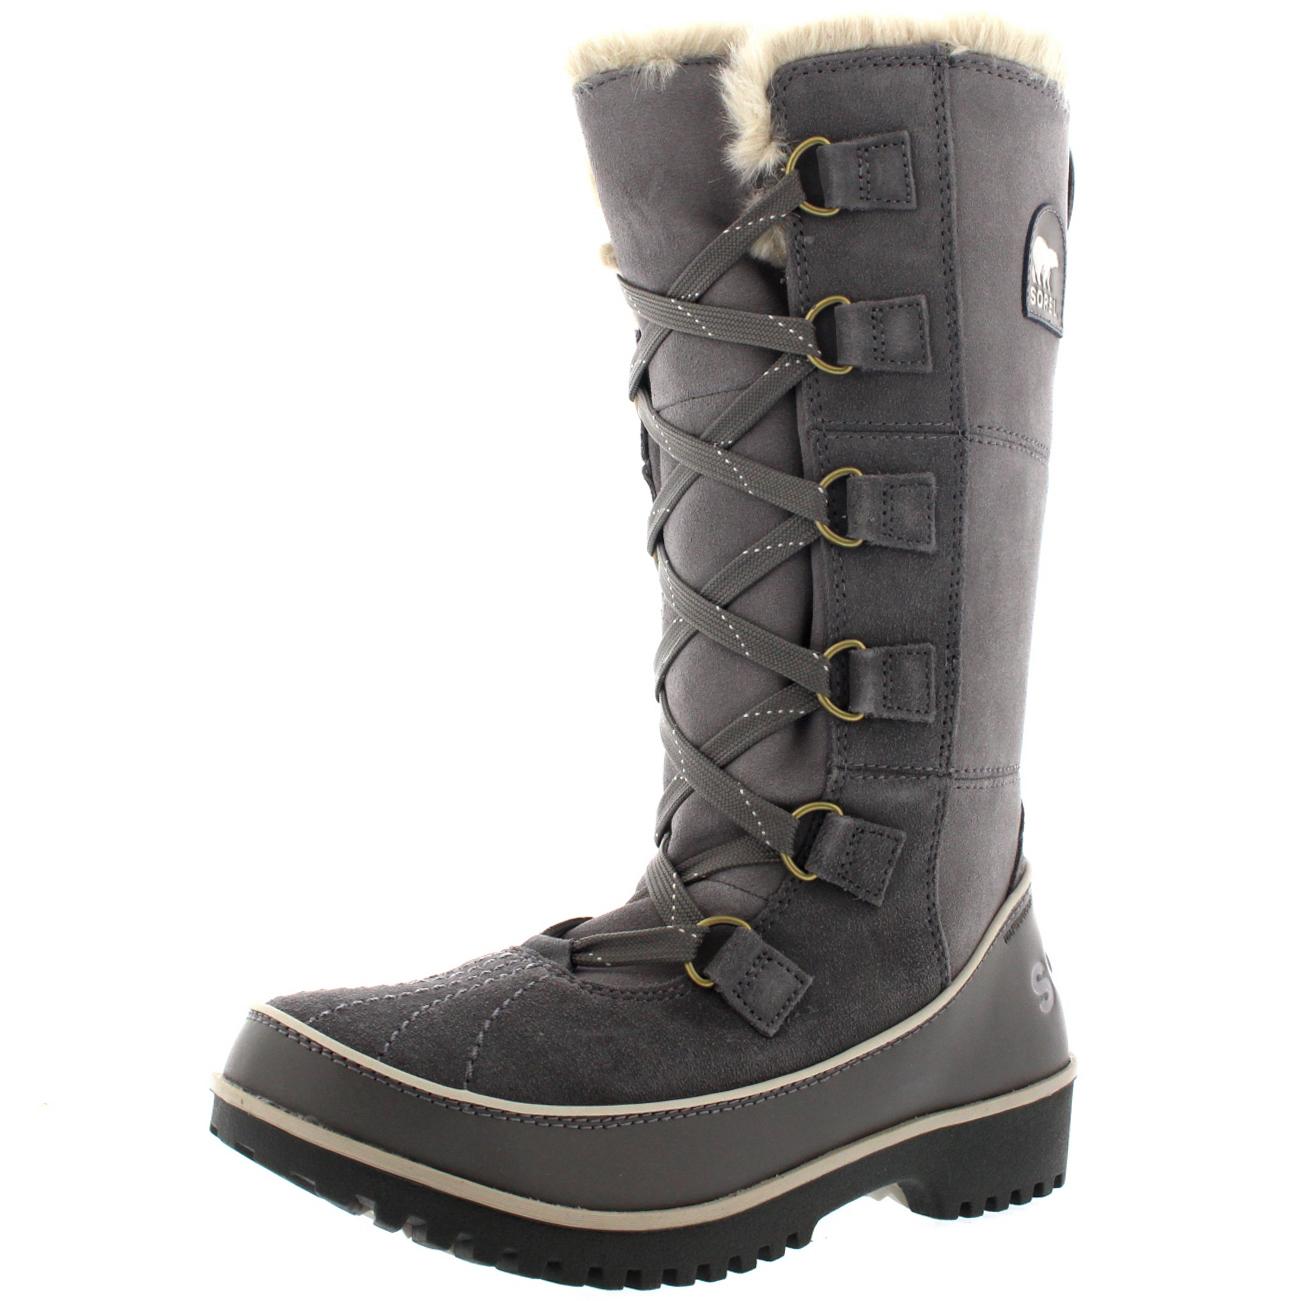 buy cheap really Sorel Suede Mid-Calf Boots cheap USA stockist SNBL7kYo